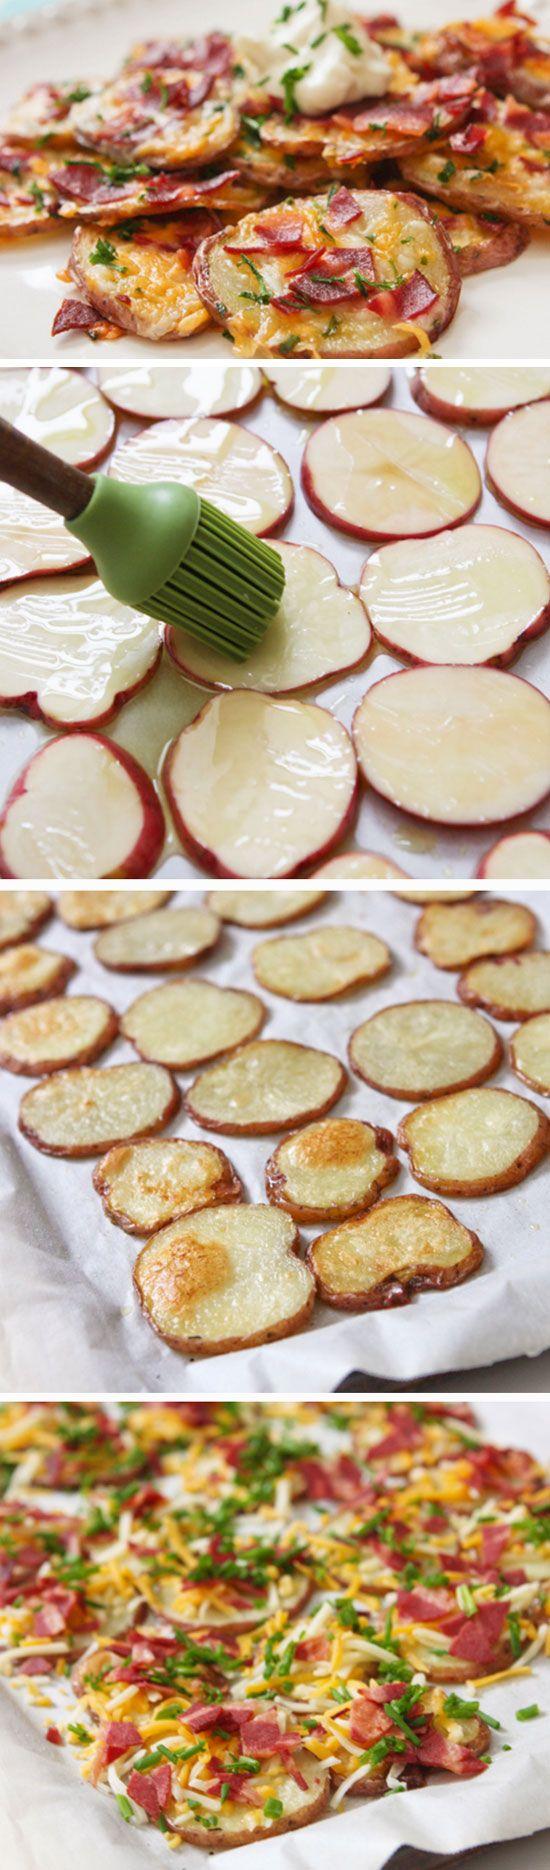 loaded potato rounds easy christmas eve dinner ideas appetizers - Christmas Eve Snacks